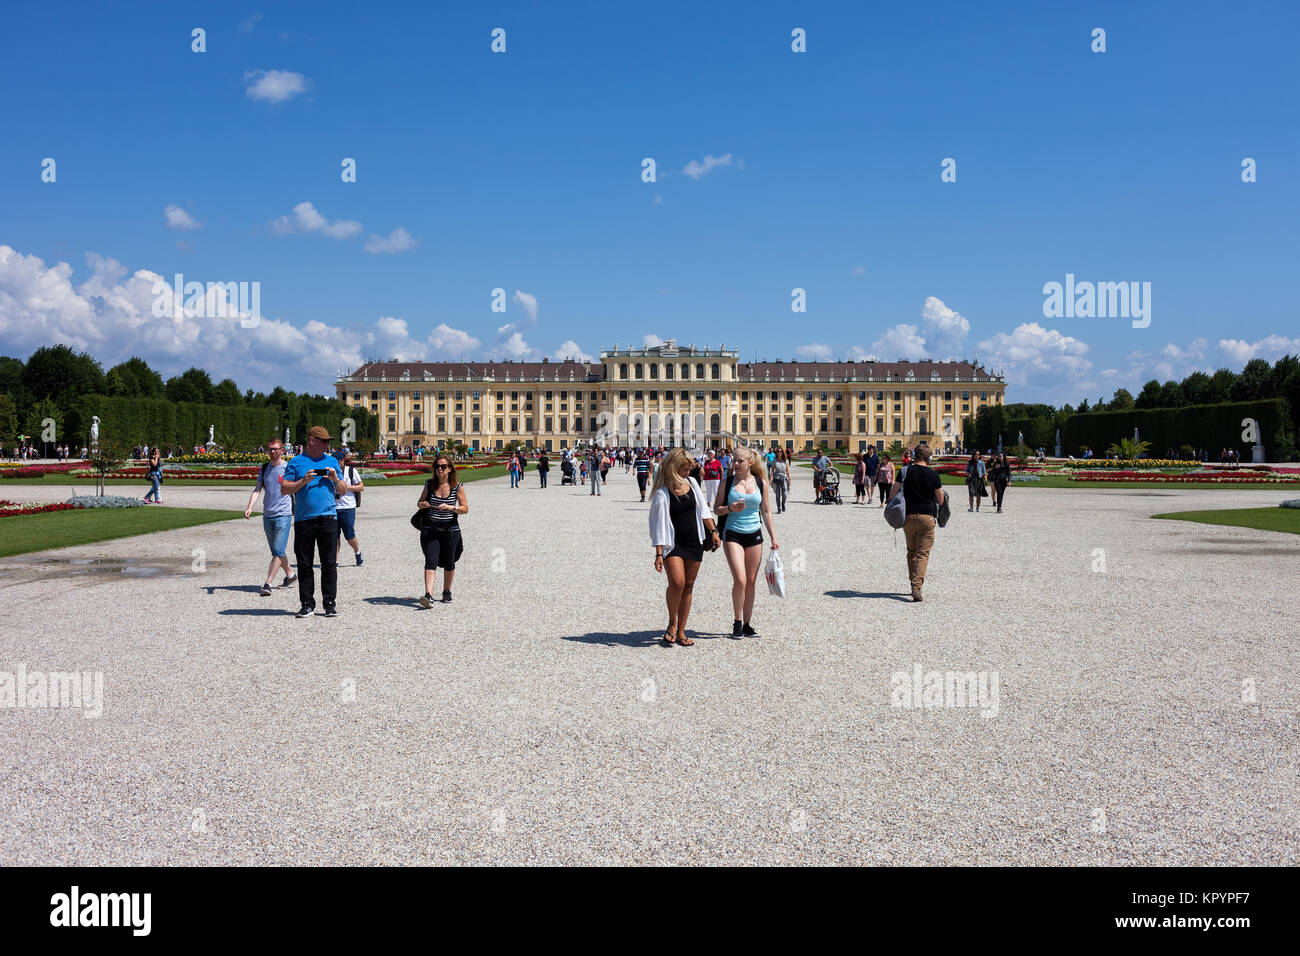 Schloss Schönbrunn, Imperial Sommer barocken Residenz, Touristen, Wien, Österreich, Europa Stockbild